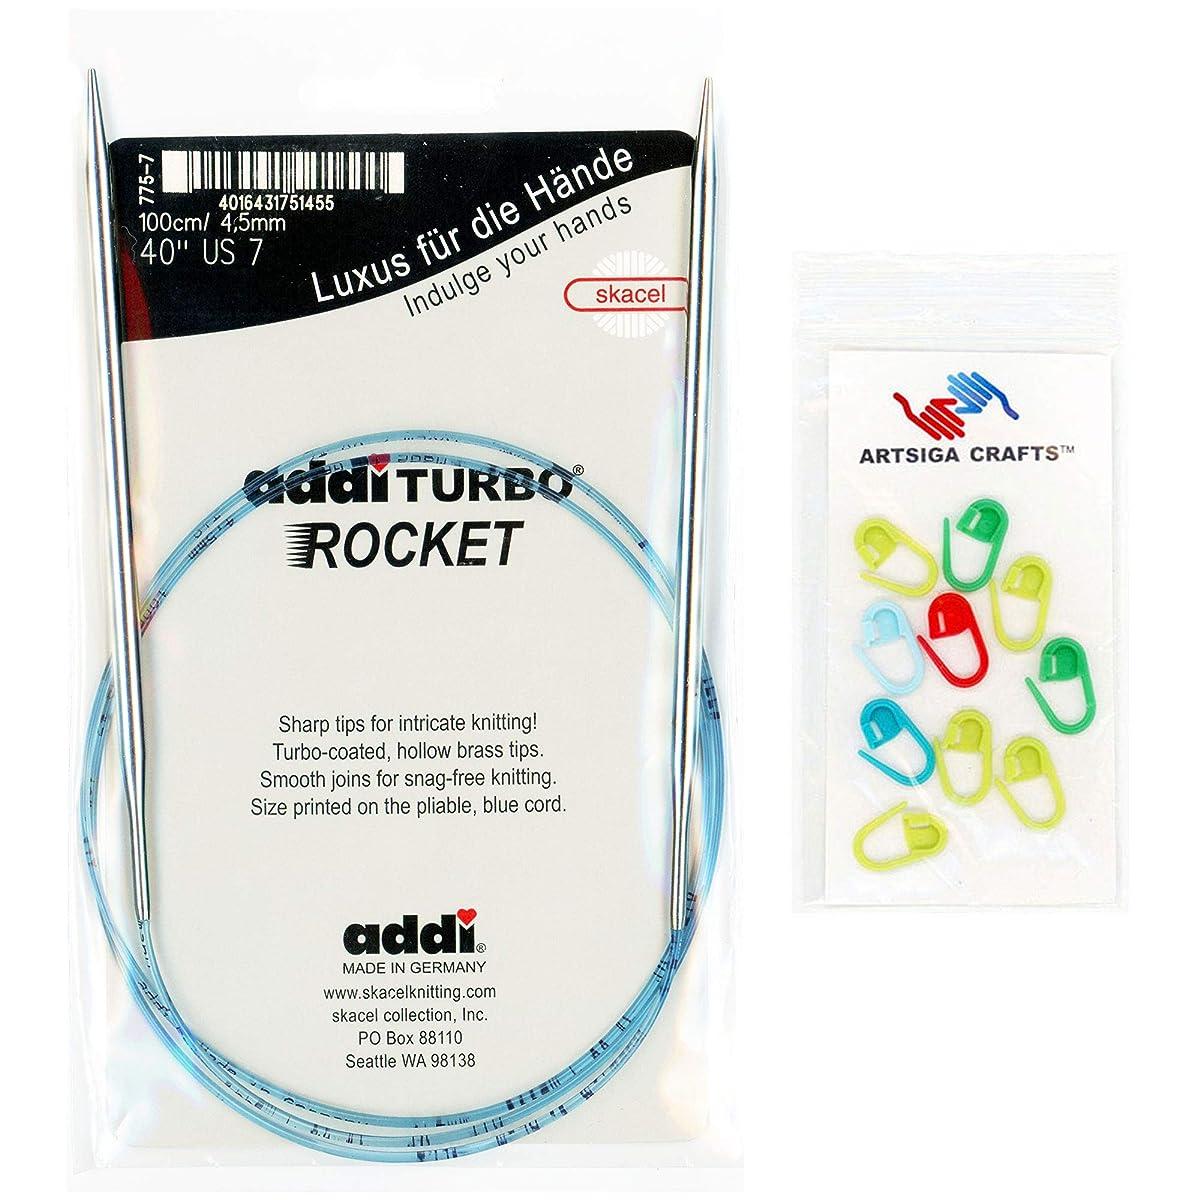 addi Knitting Needle Circular Turbo Rocket Lace White-Bronze Skacel Exclusive Blue Cord 40 inch (100cm) Size US 2.25mm Bundle with 10 Artsiga Crafts Stitch Markers